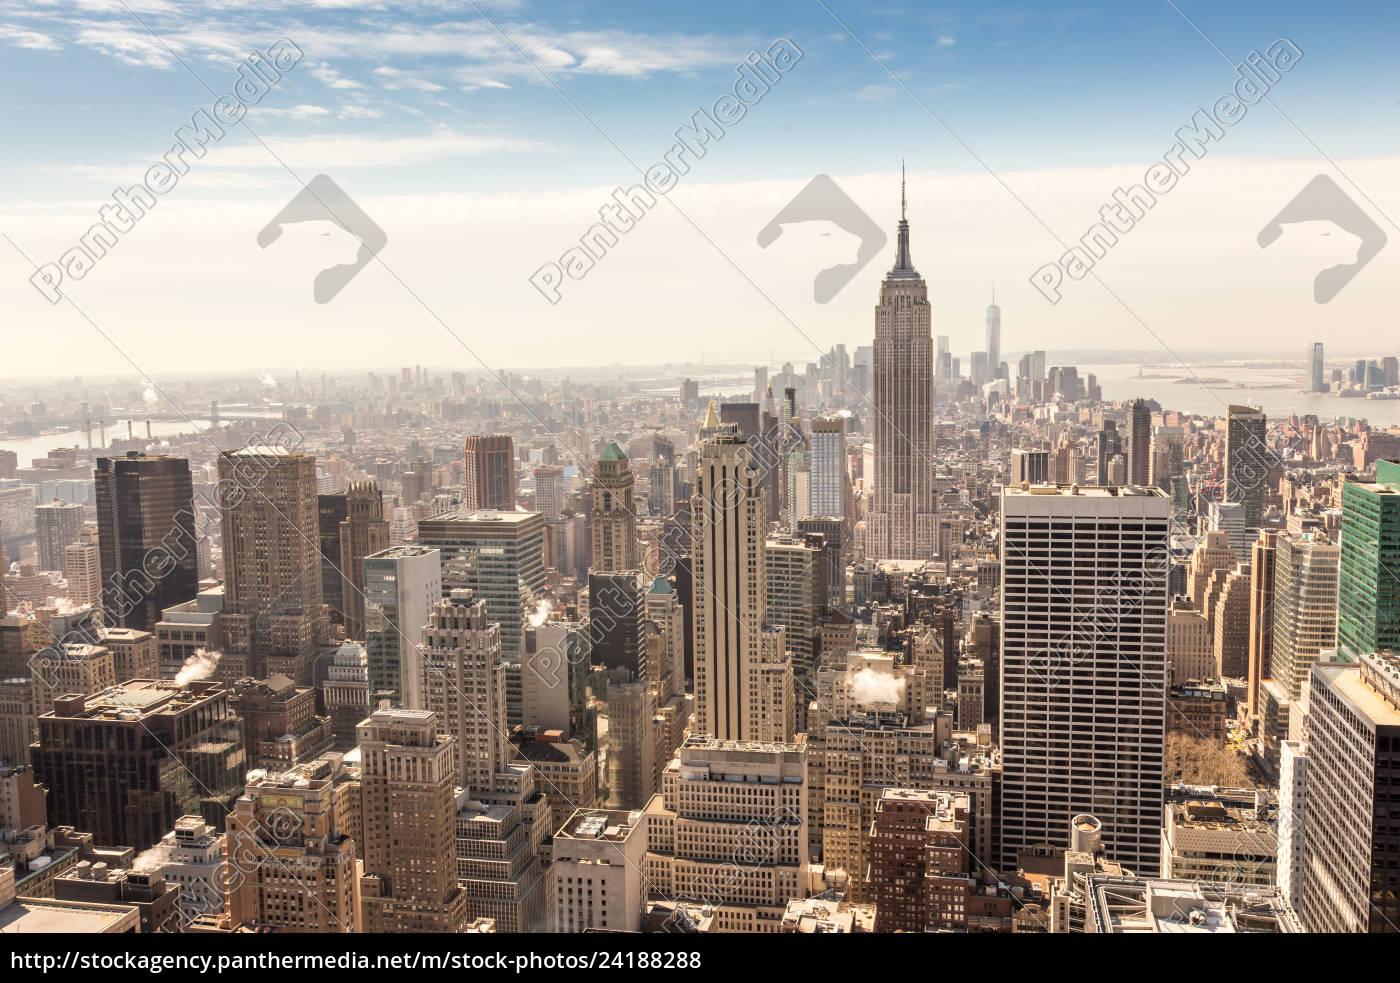 panoramę, centrum, nowego, jorku, na, manhattanie. - 24188288